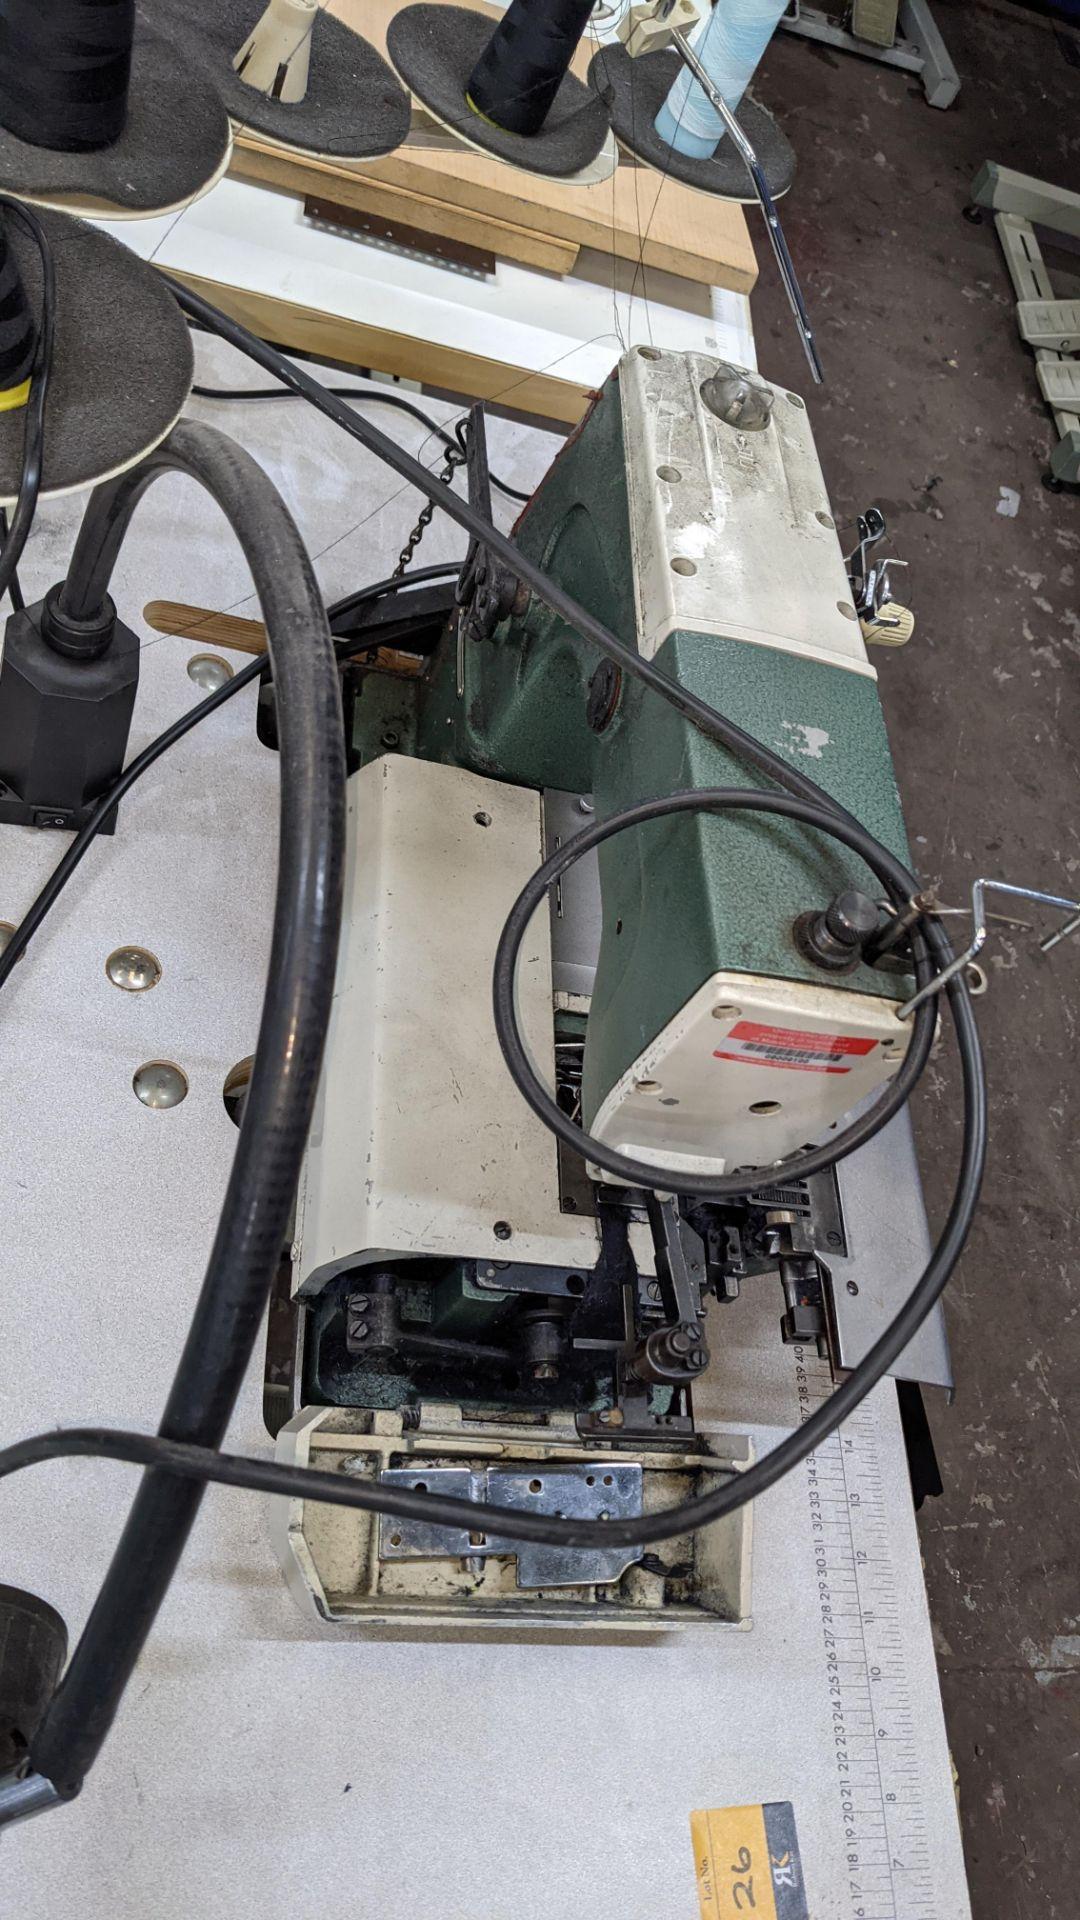 Sewing machine - Image 9 of 16